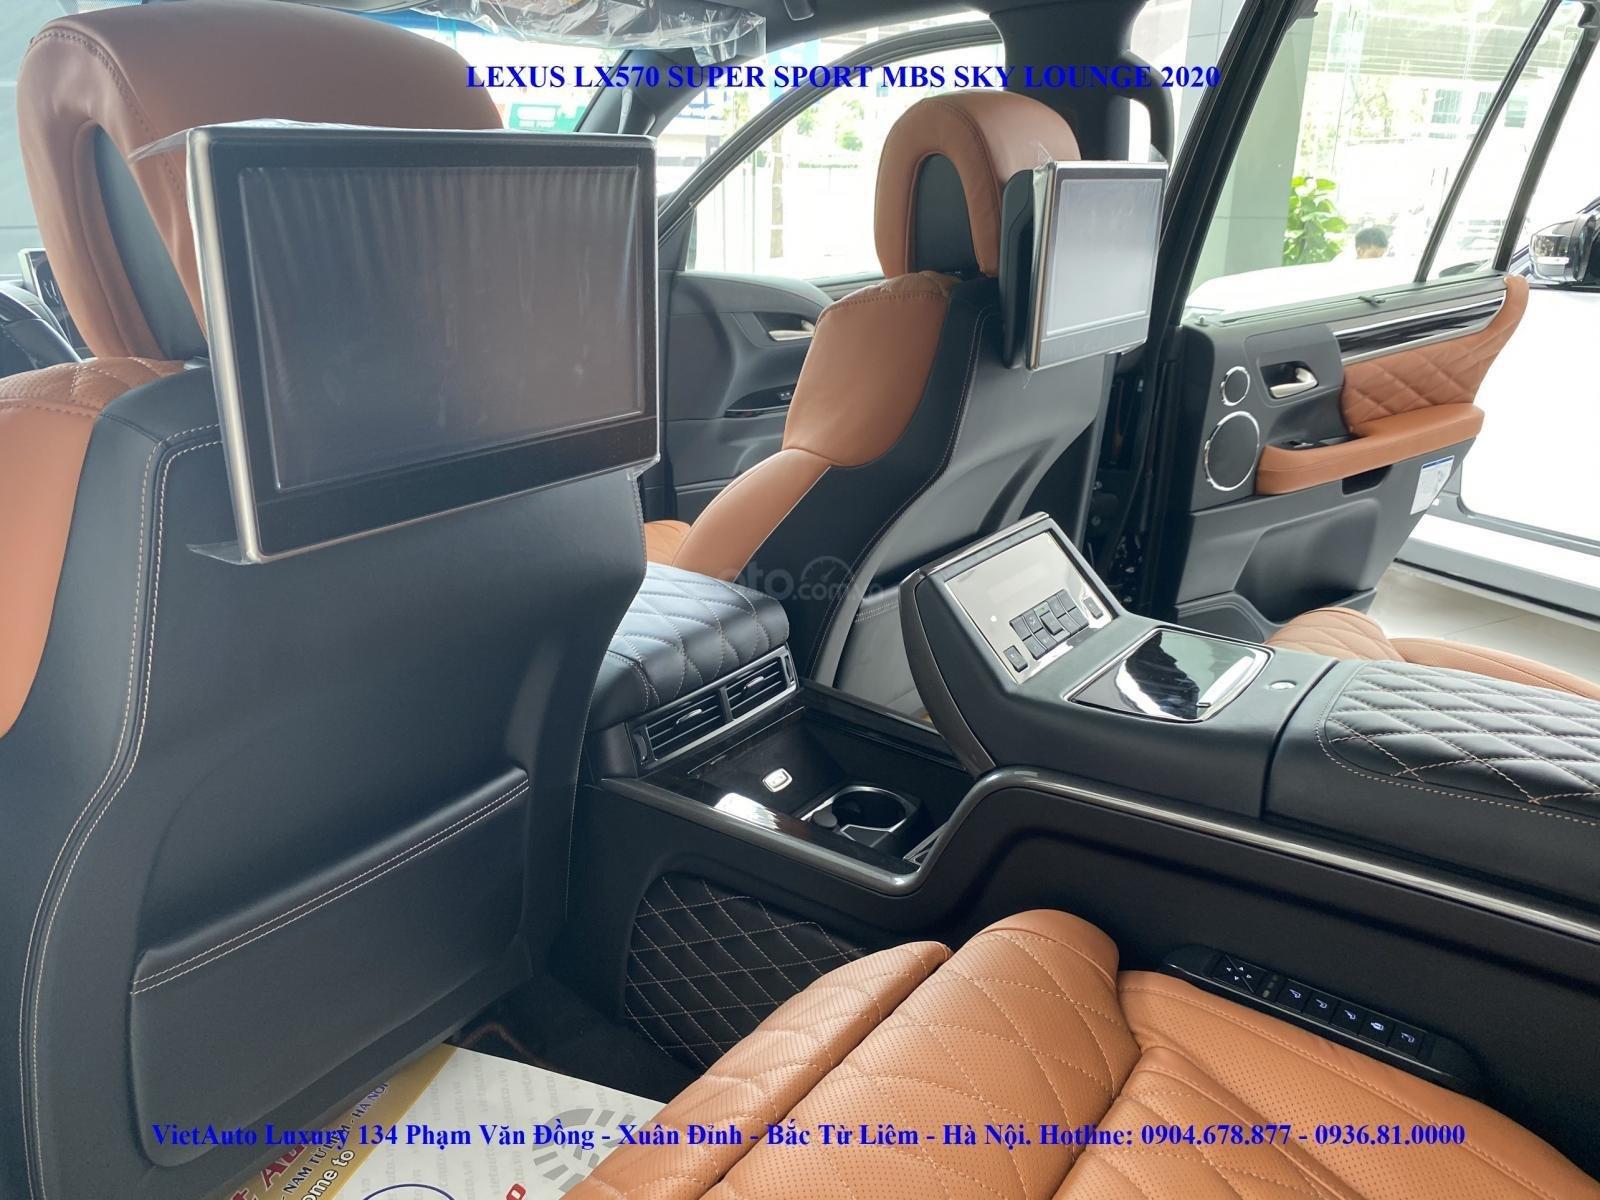 Bán Lexus LX570 Super Sport MBS bản 04 chỗ ngồi, sản xuất 2020 (11)